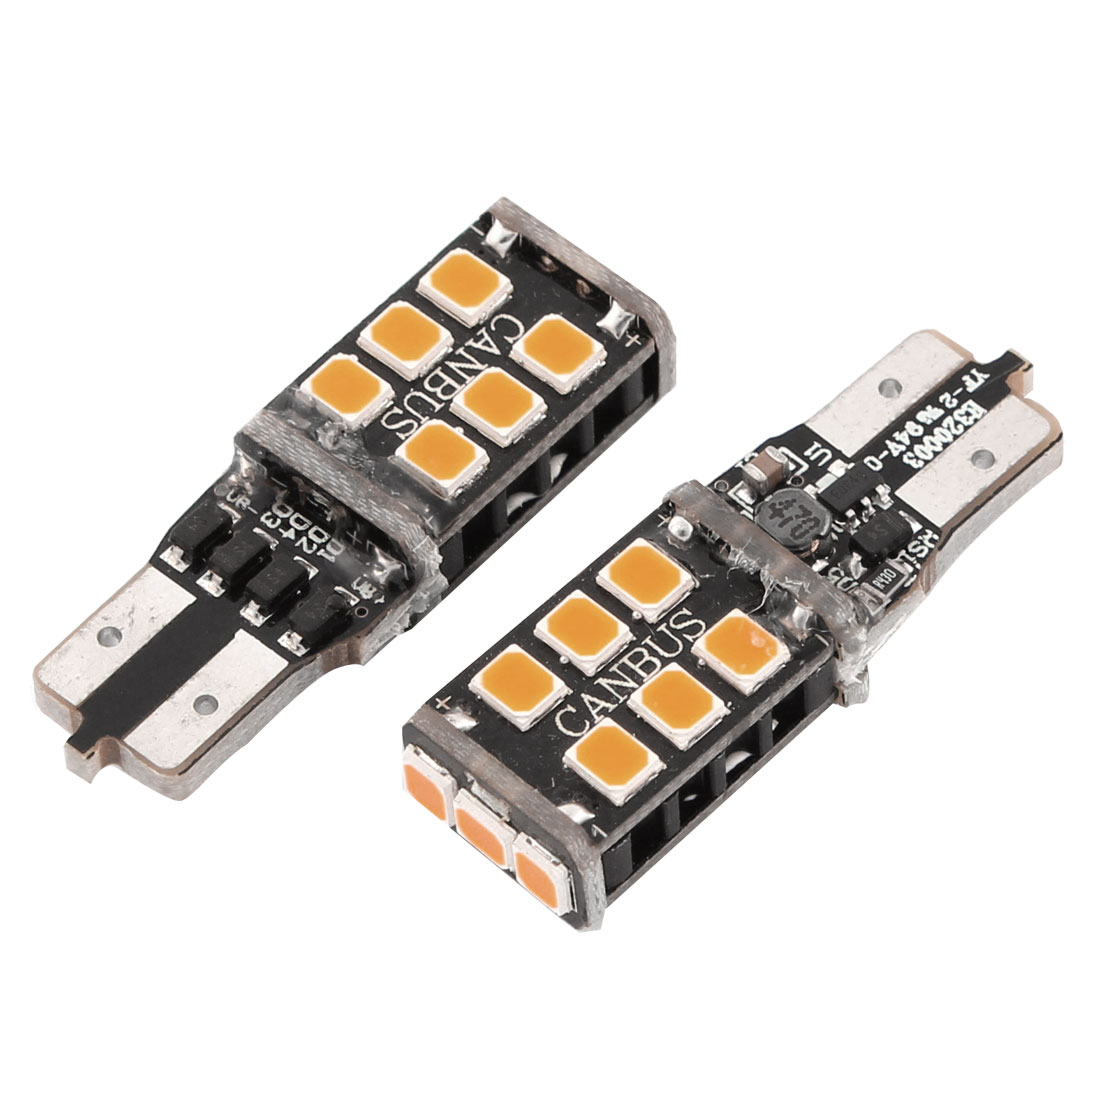 2 Pcs T10 W5W Yellow 3528 15-SMD LED Car Non-Polar Dashboard Bulbs Internal